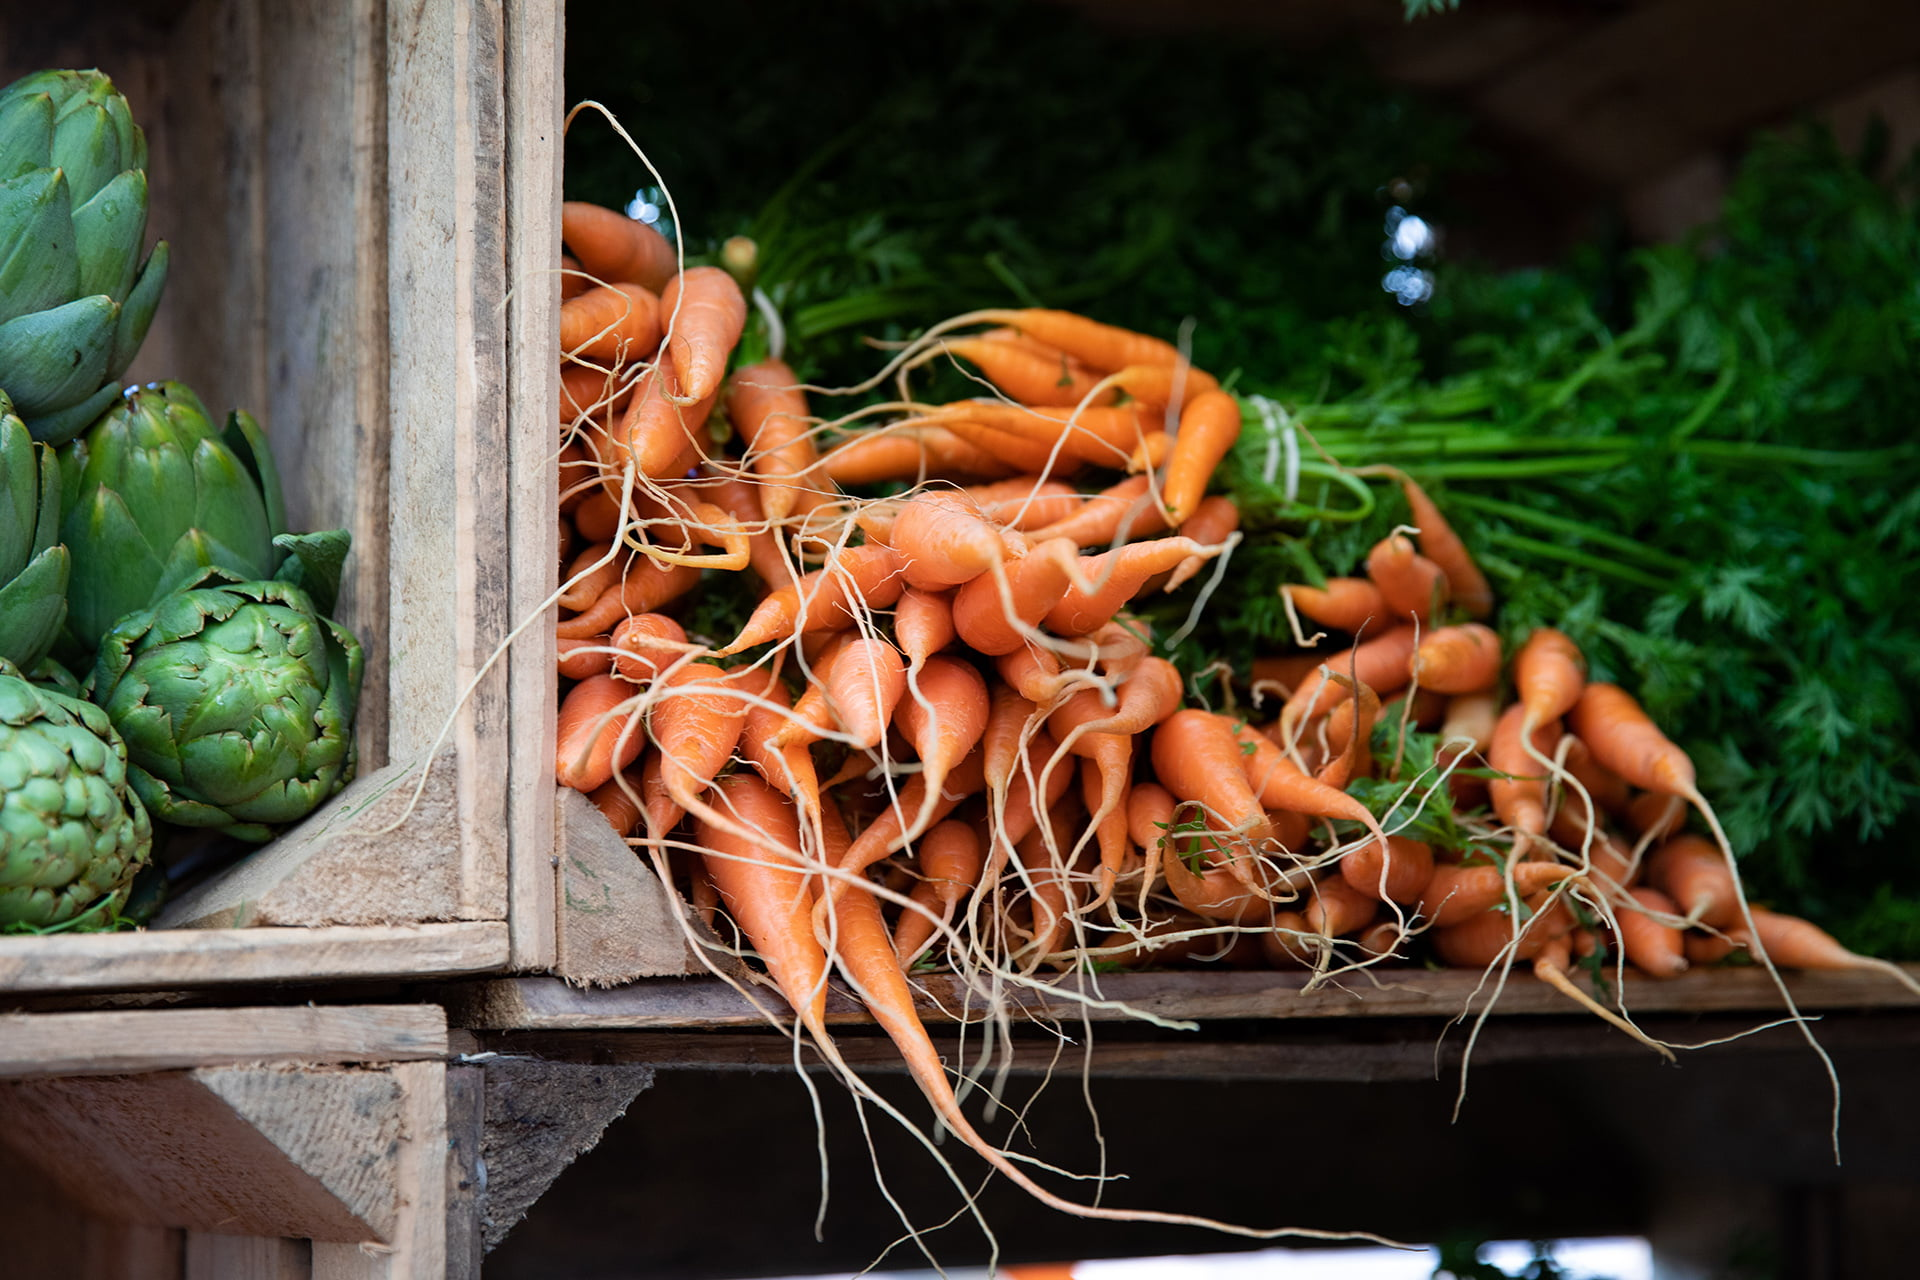 Morötter i trälåda.